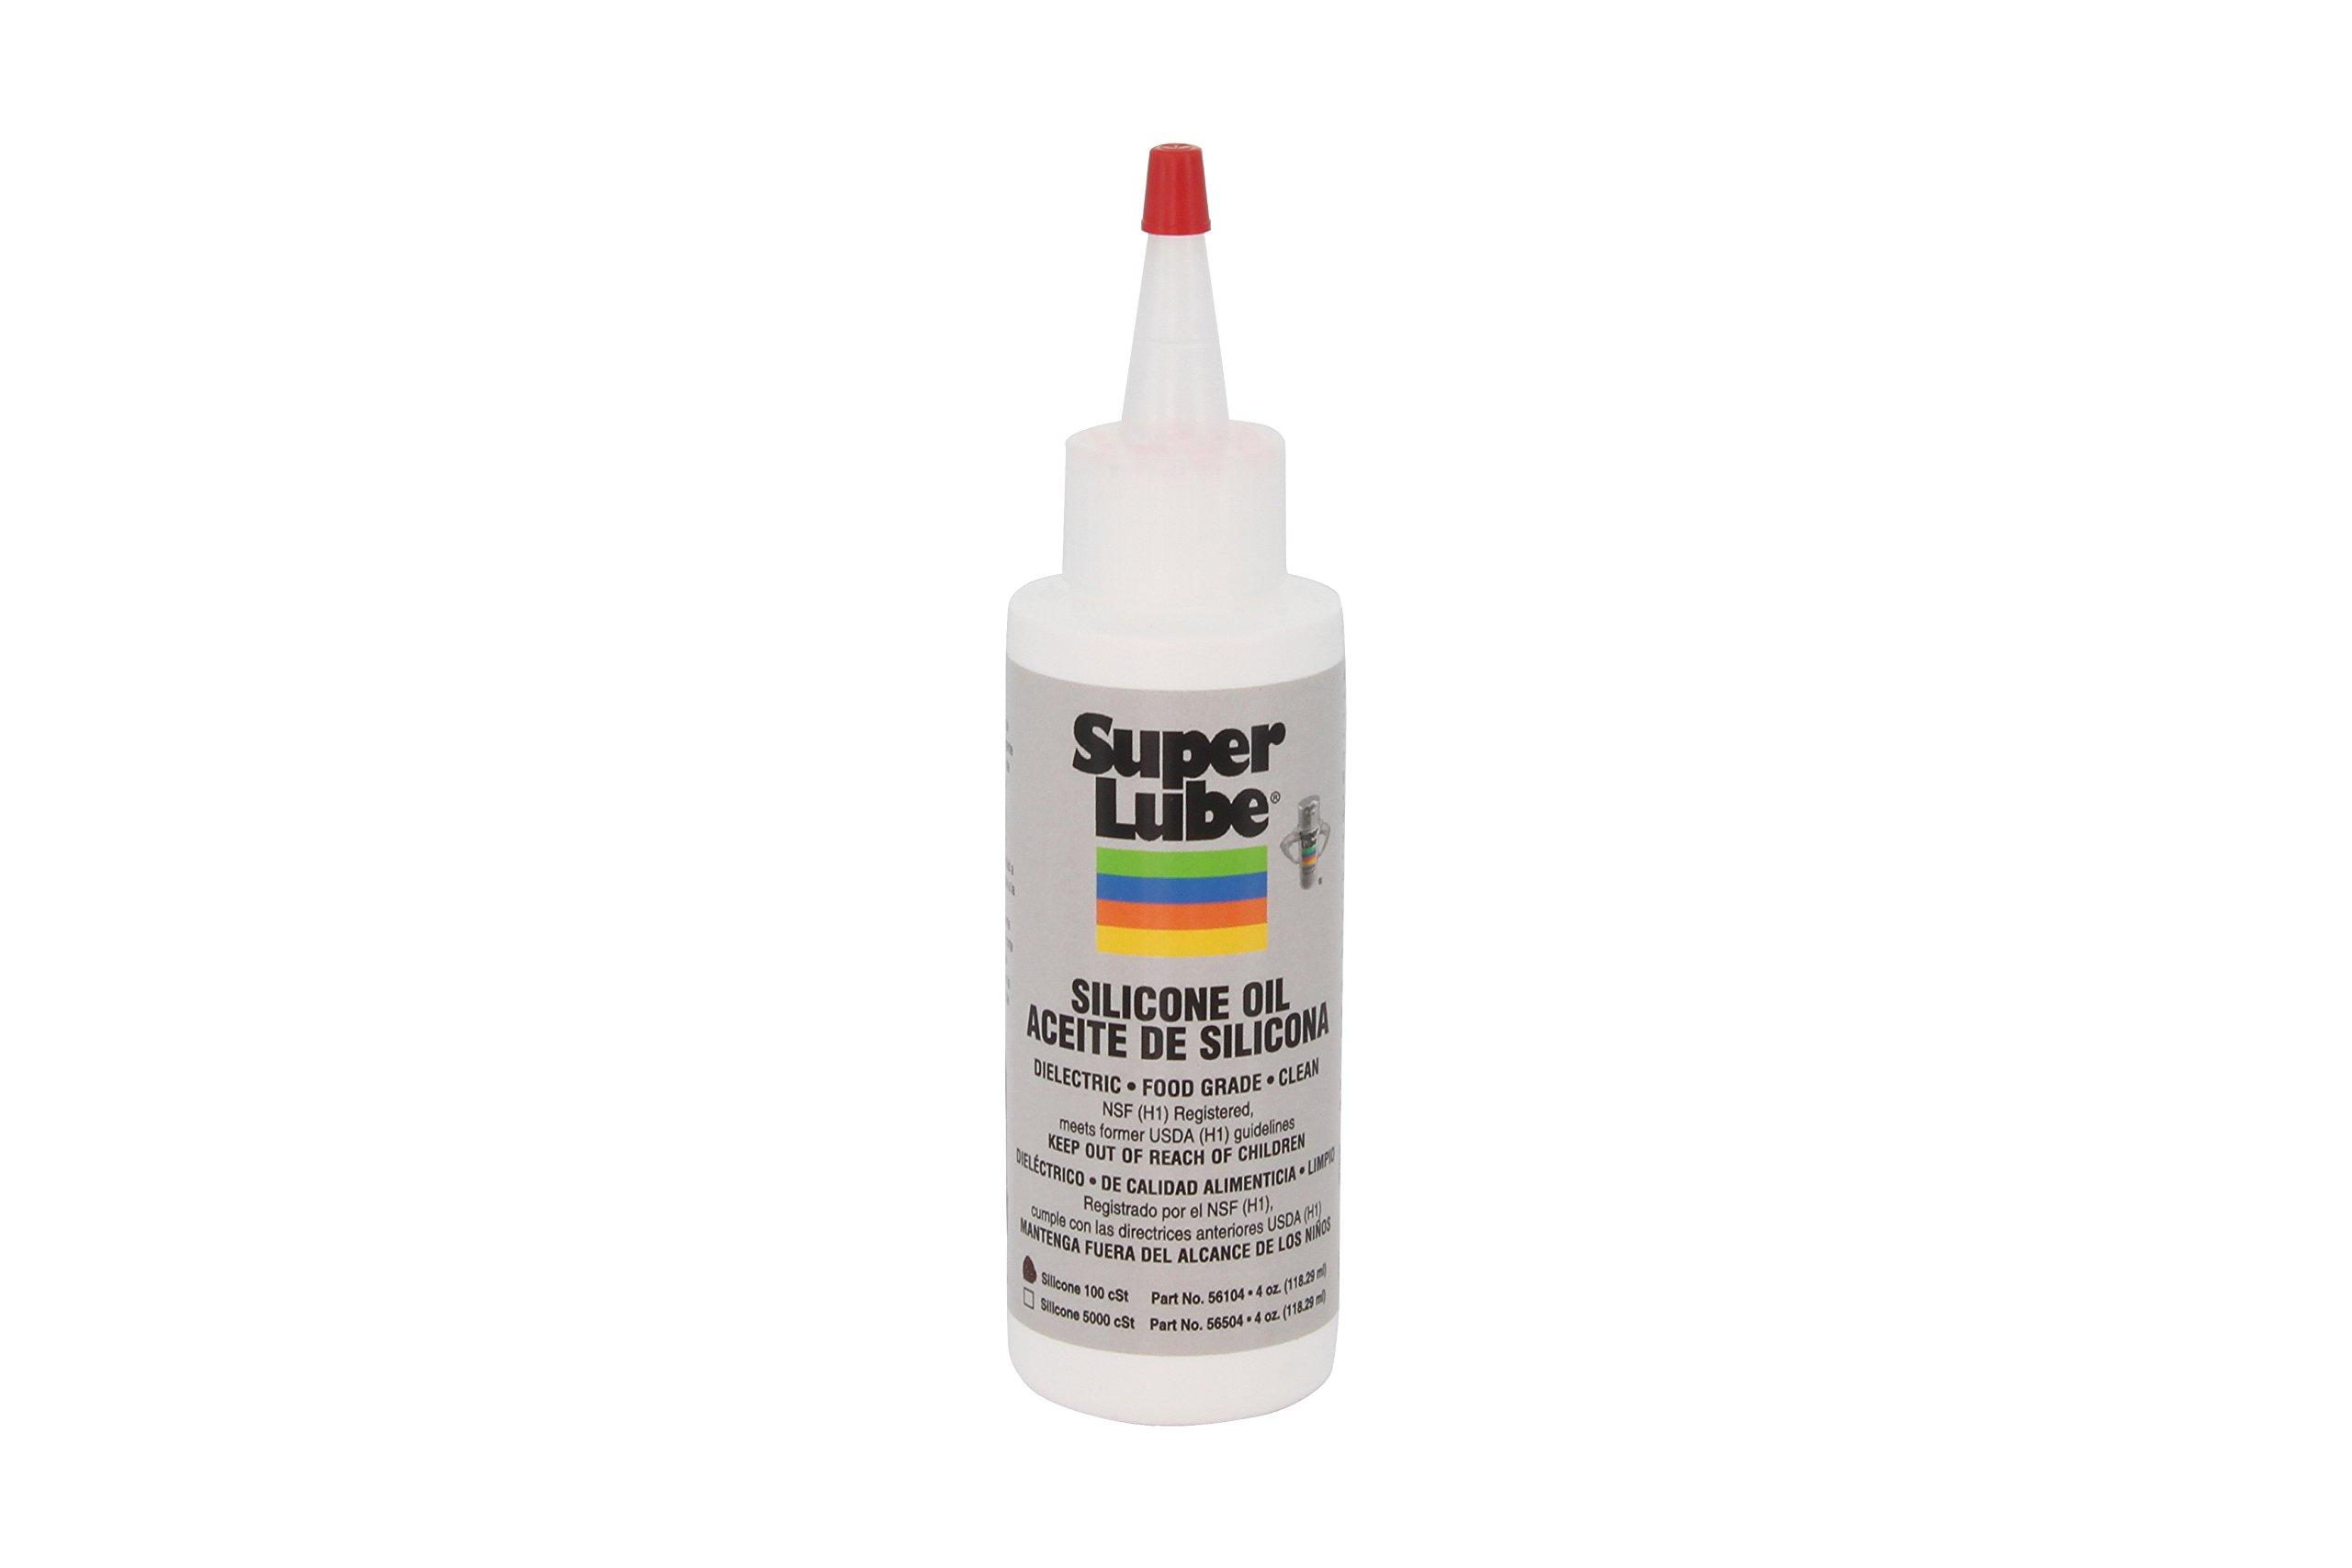 Super Lube 56104 Silicone Oil 100 CST, Clear